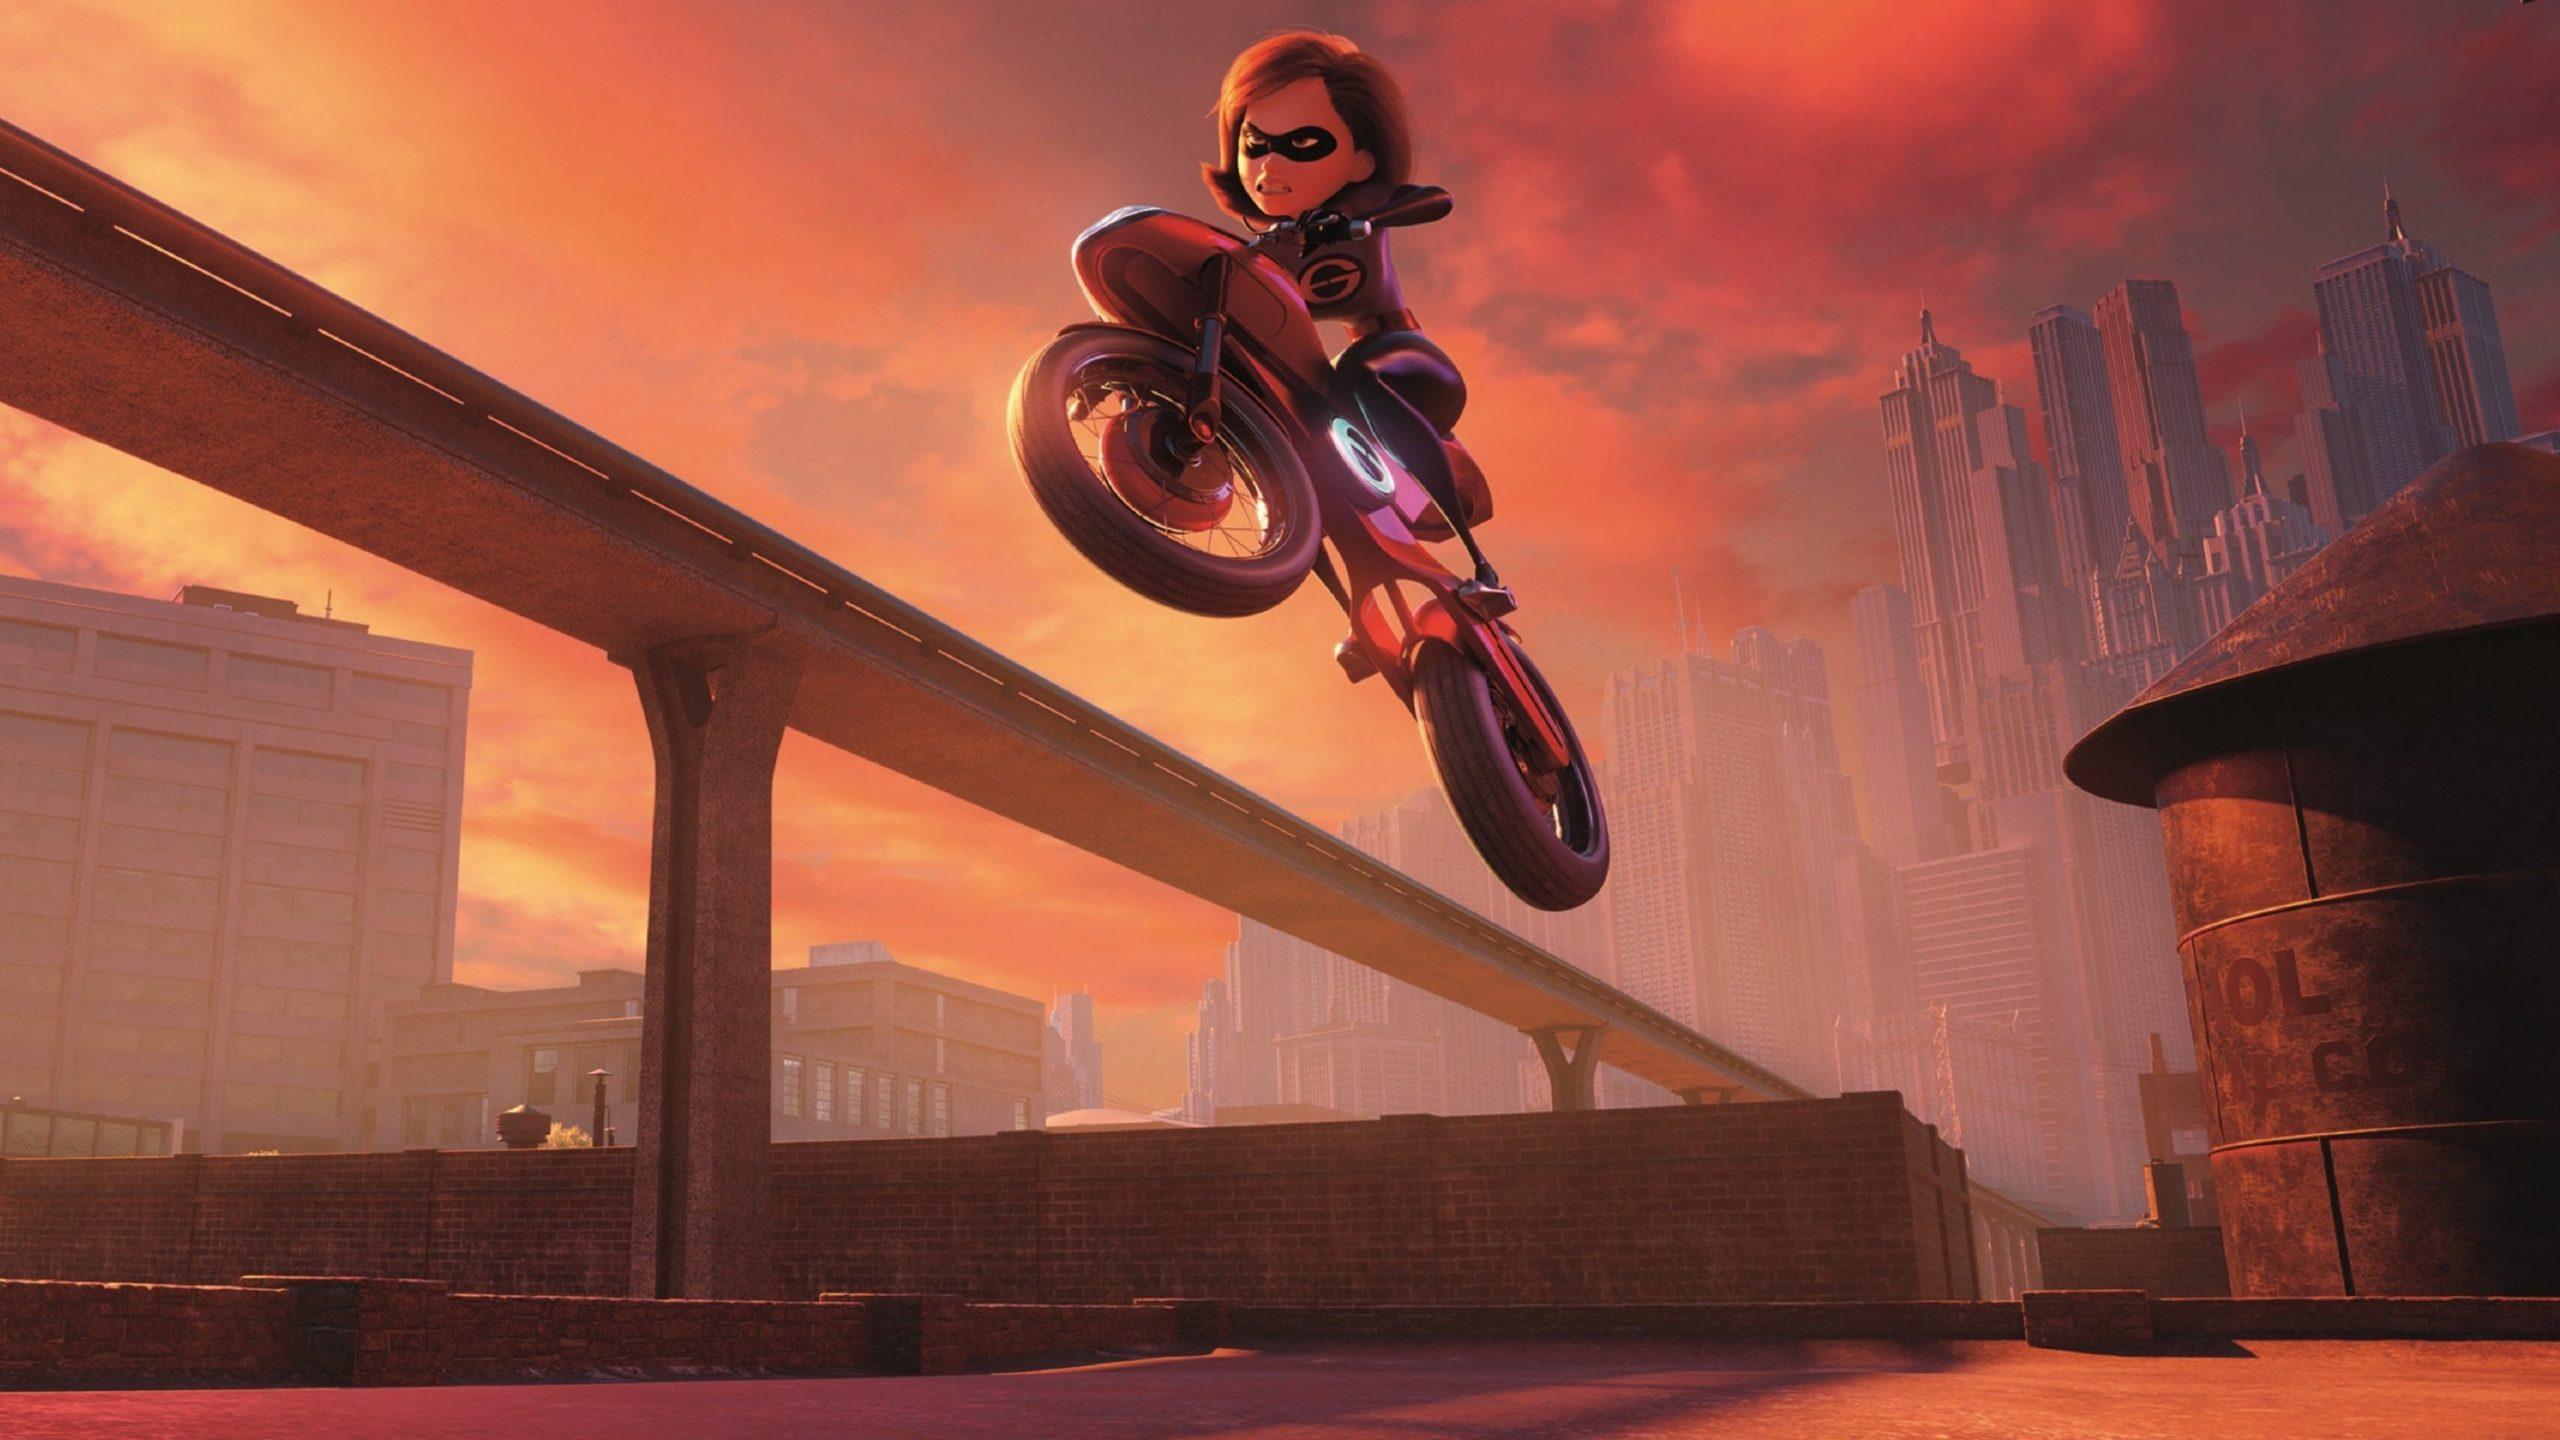 Incredibles 2 backdrop